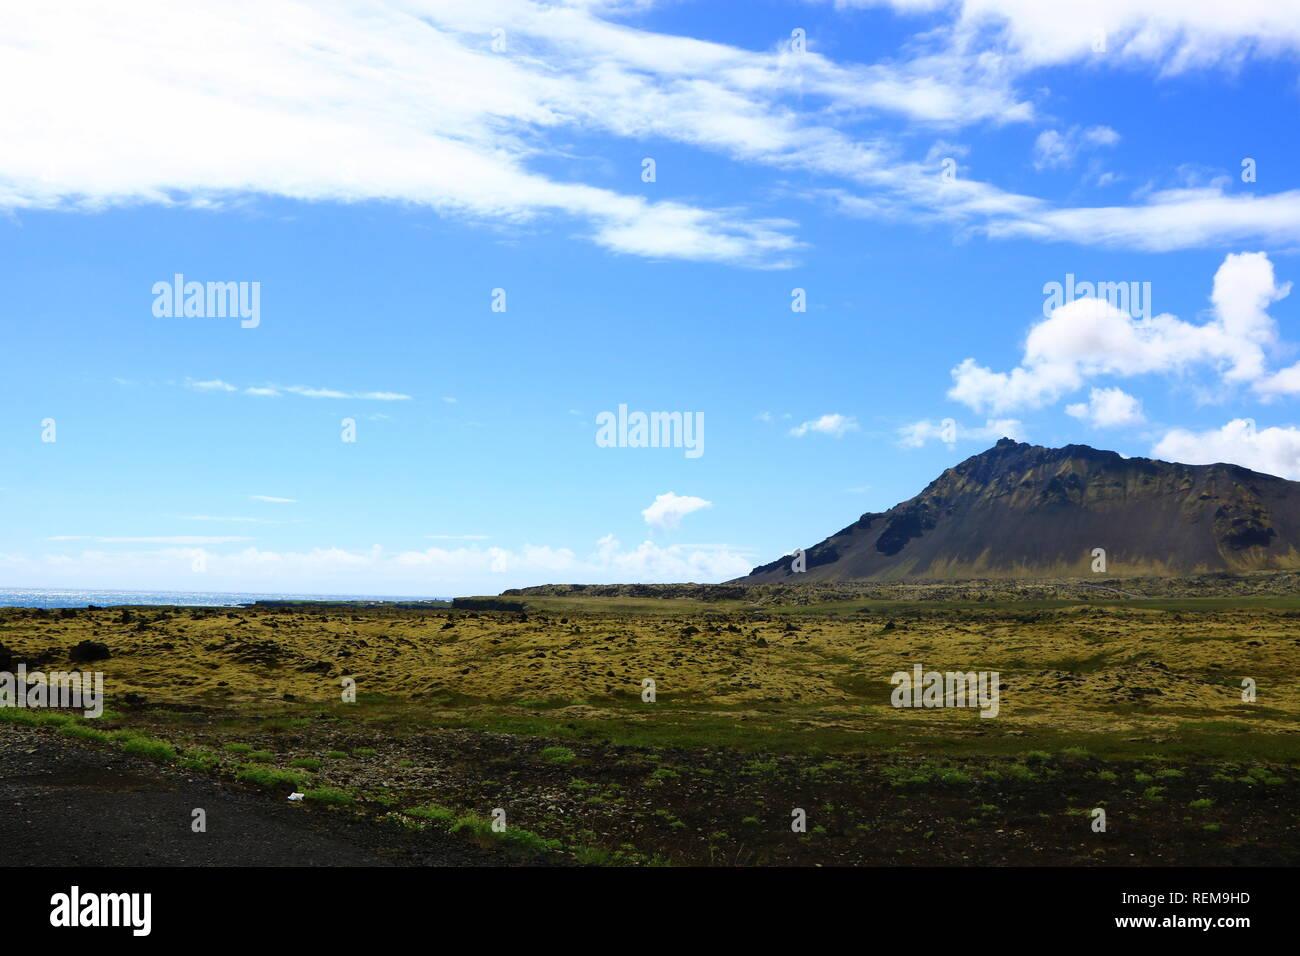 Lavafelder mit Moos in Island - Stock Image